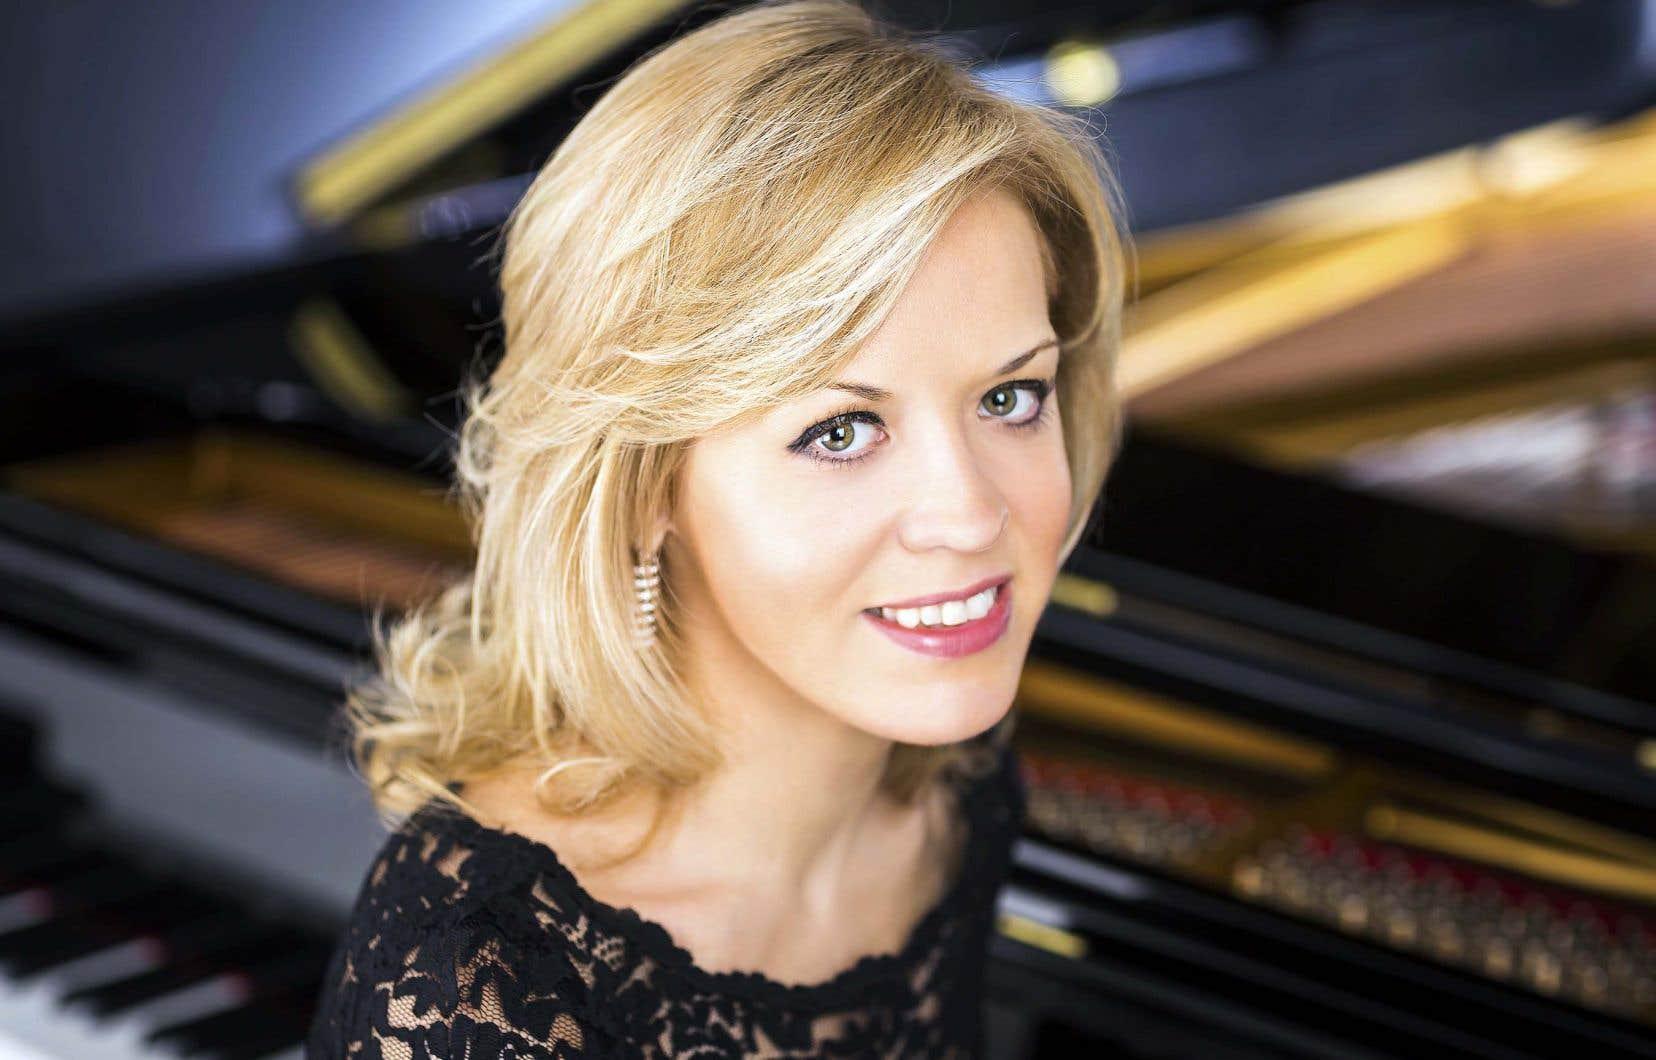 La pianiste russo-américaine Olga Kern